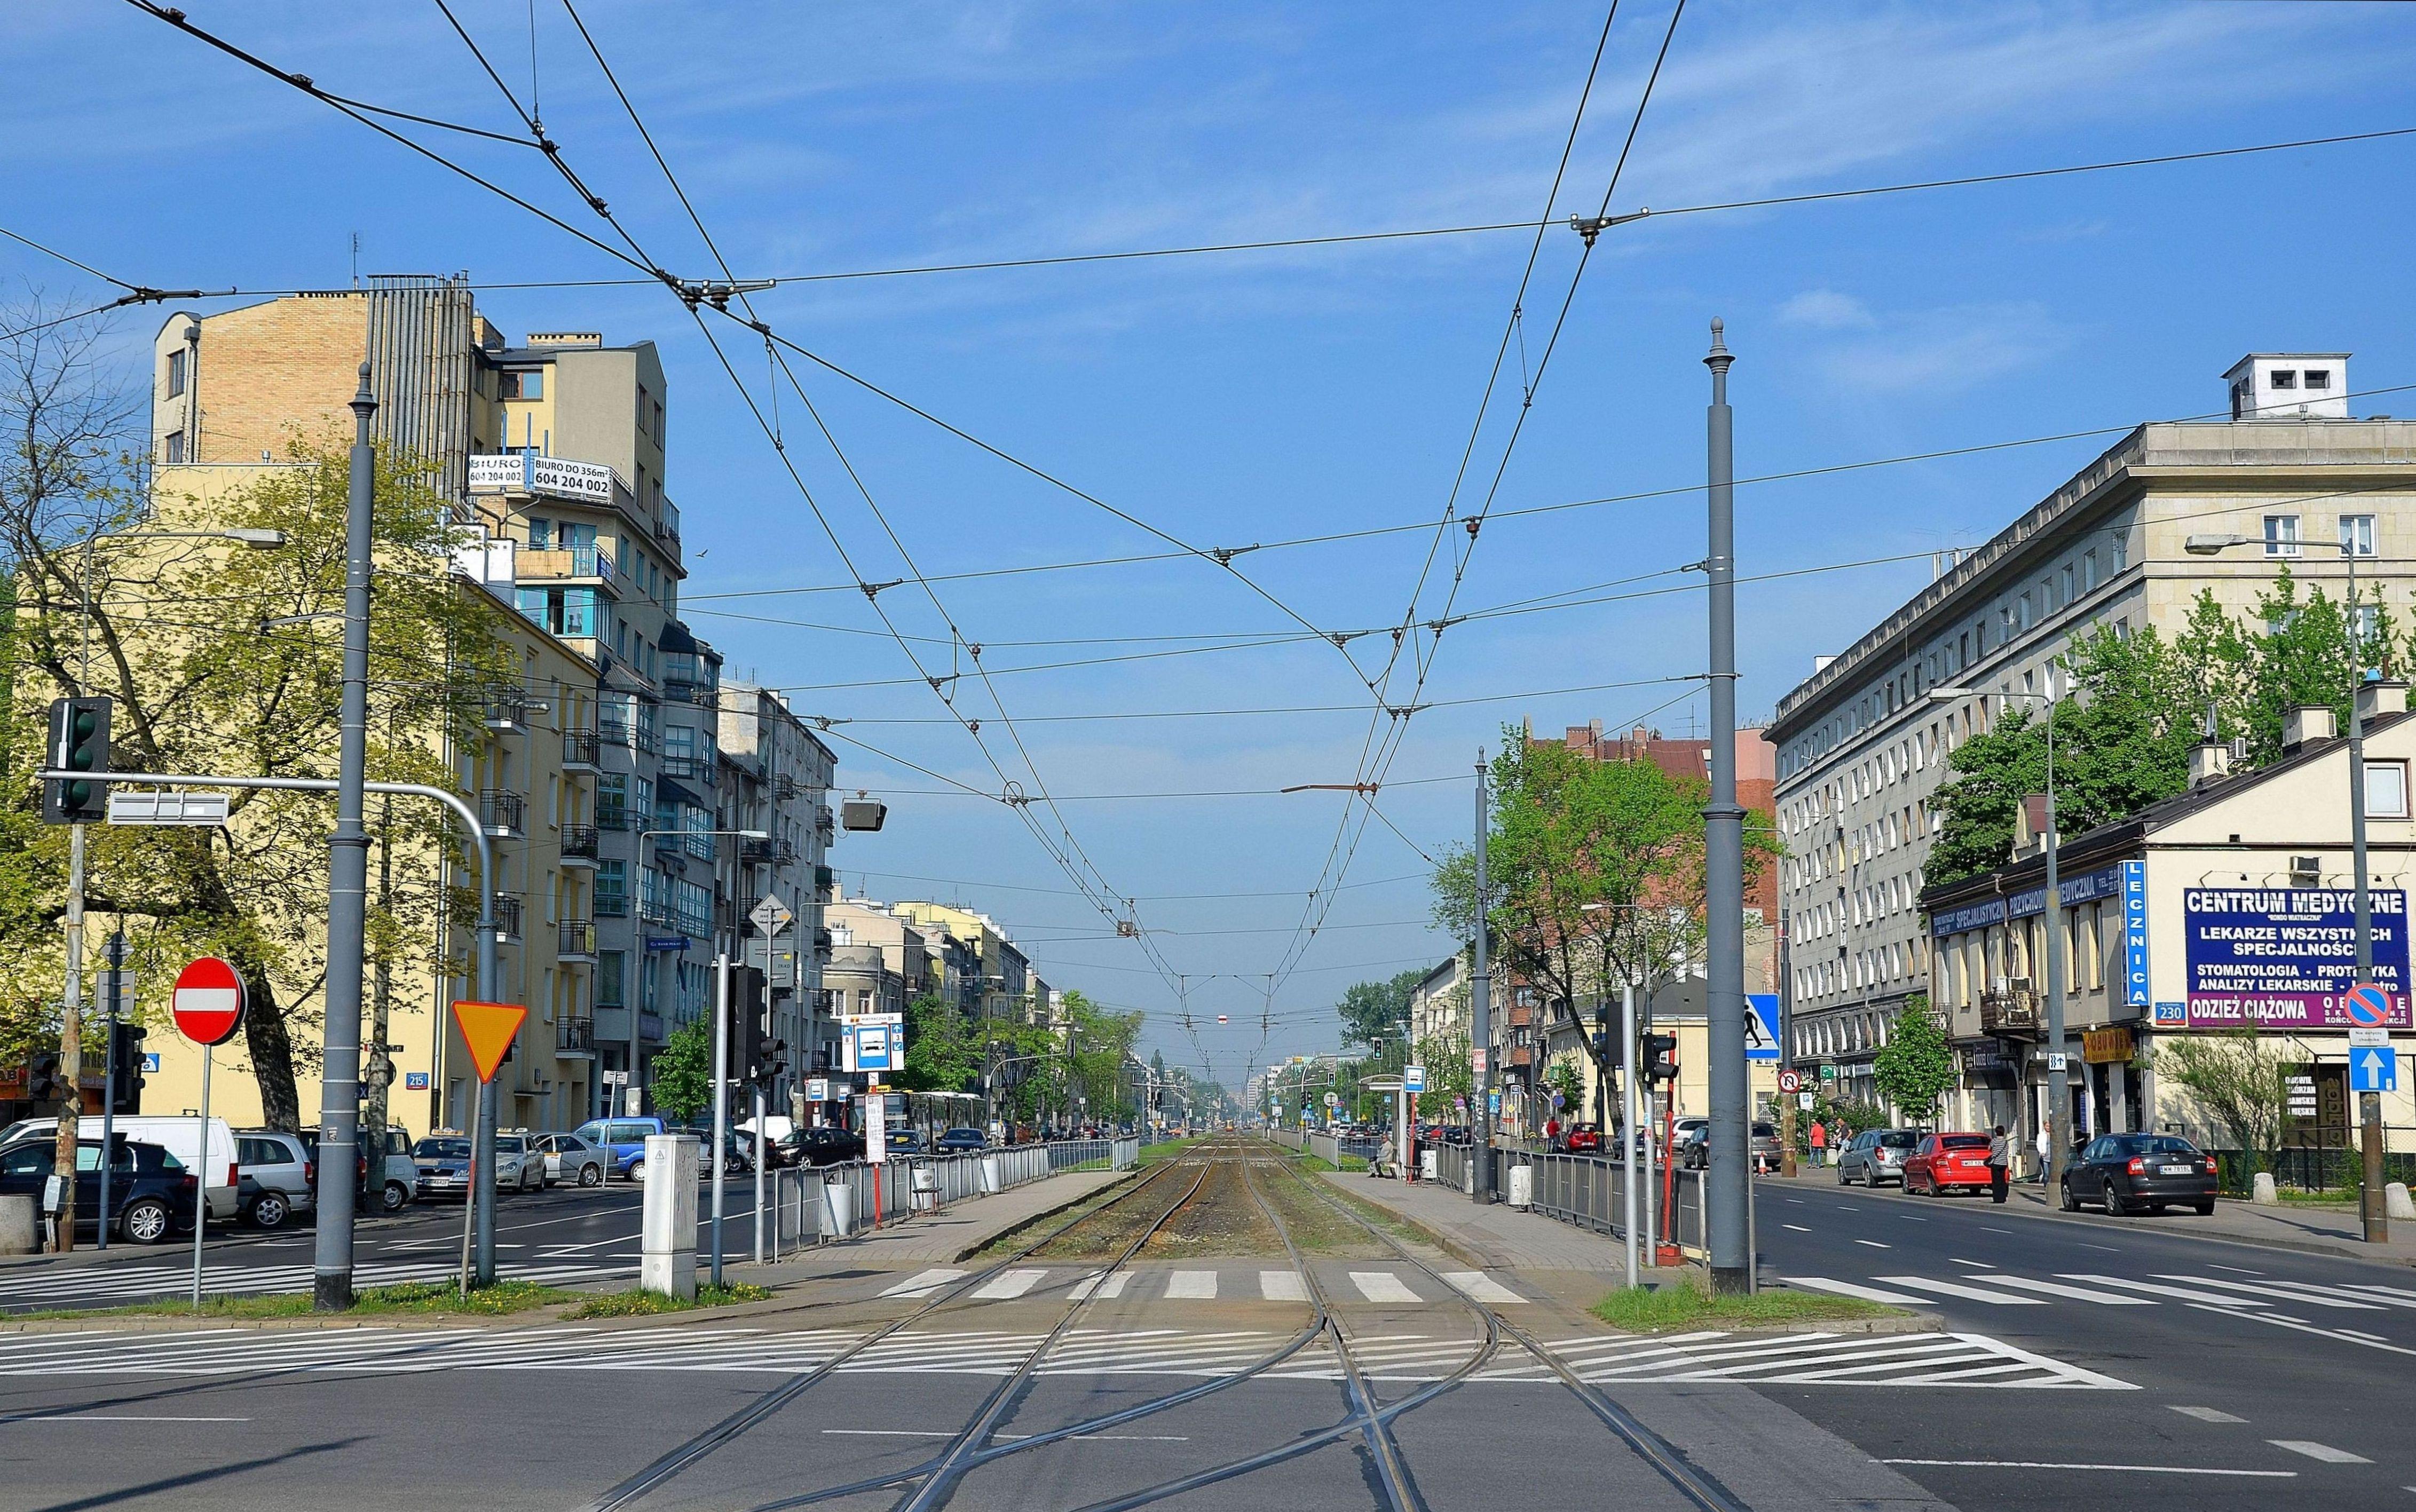 Ulica Grochowska